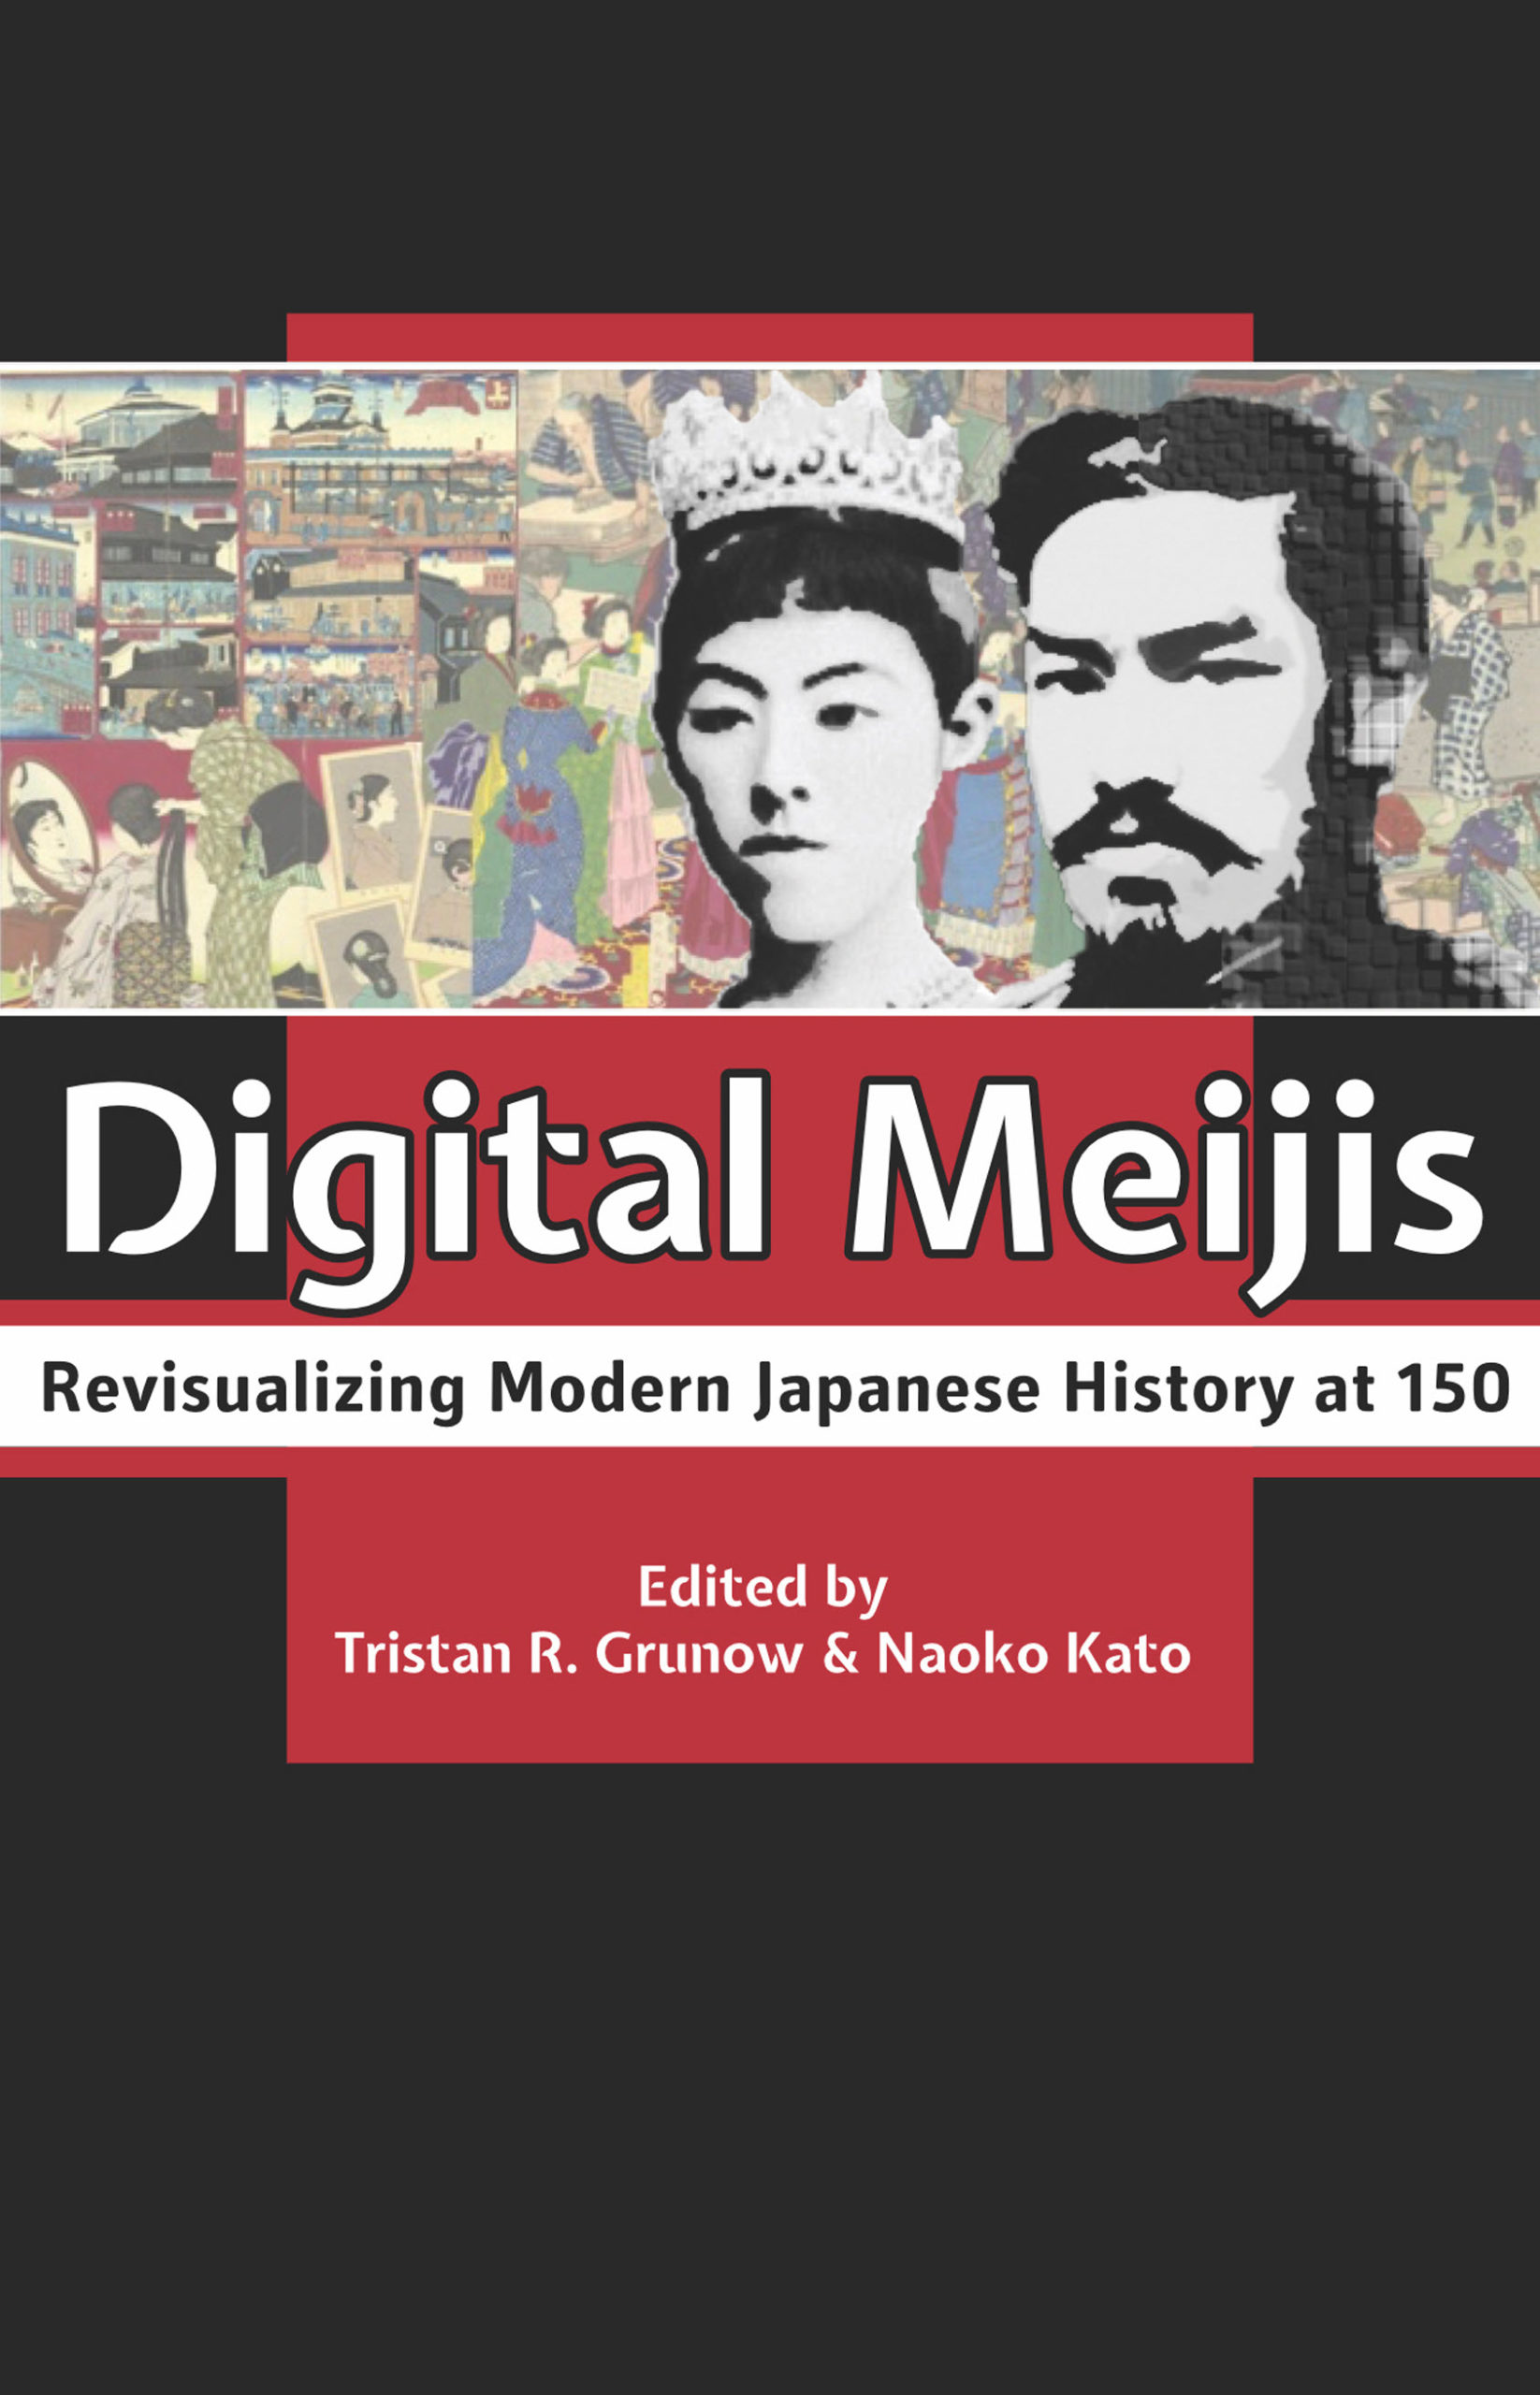 Cover image for Digital Meijis